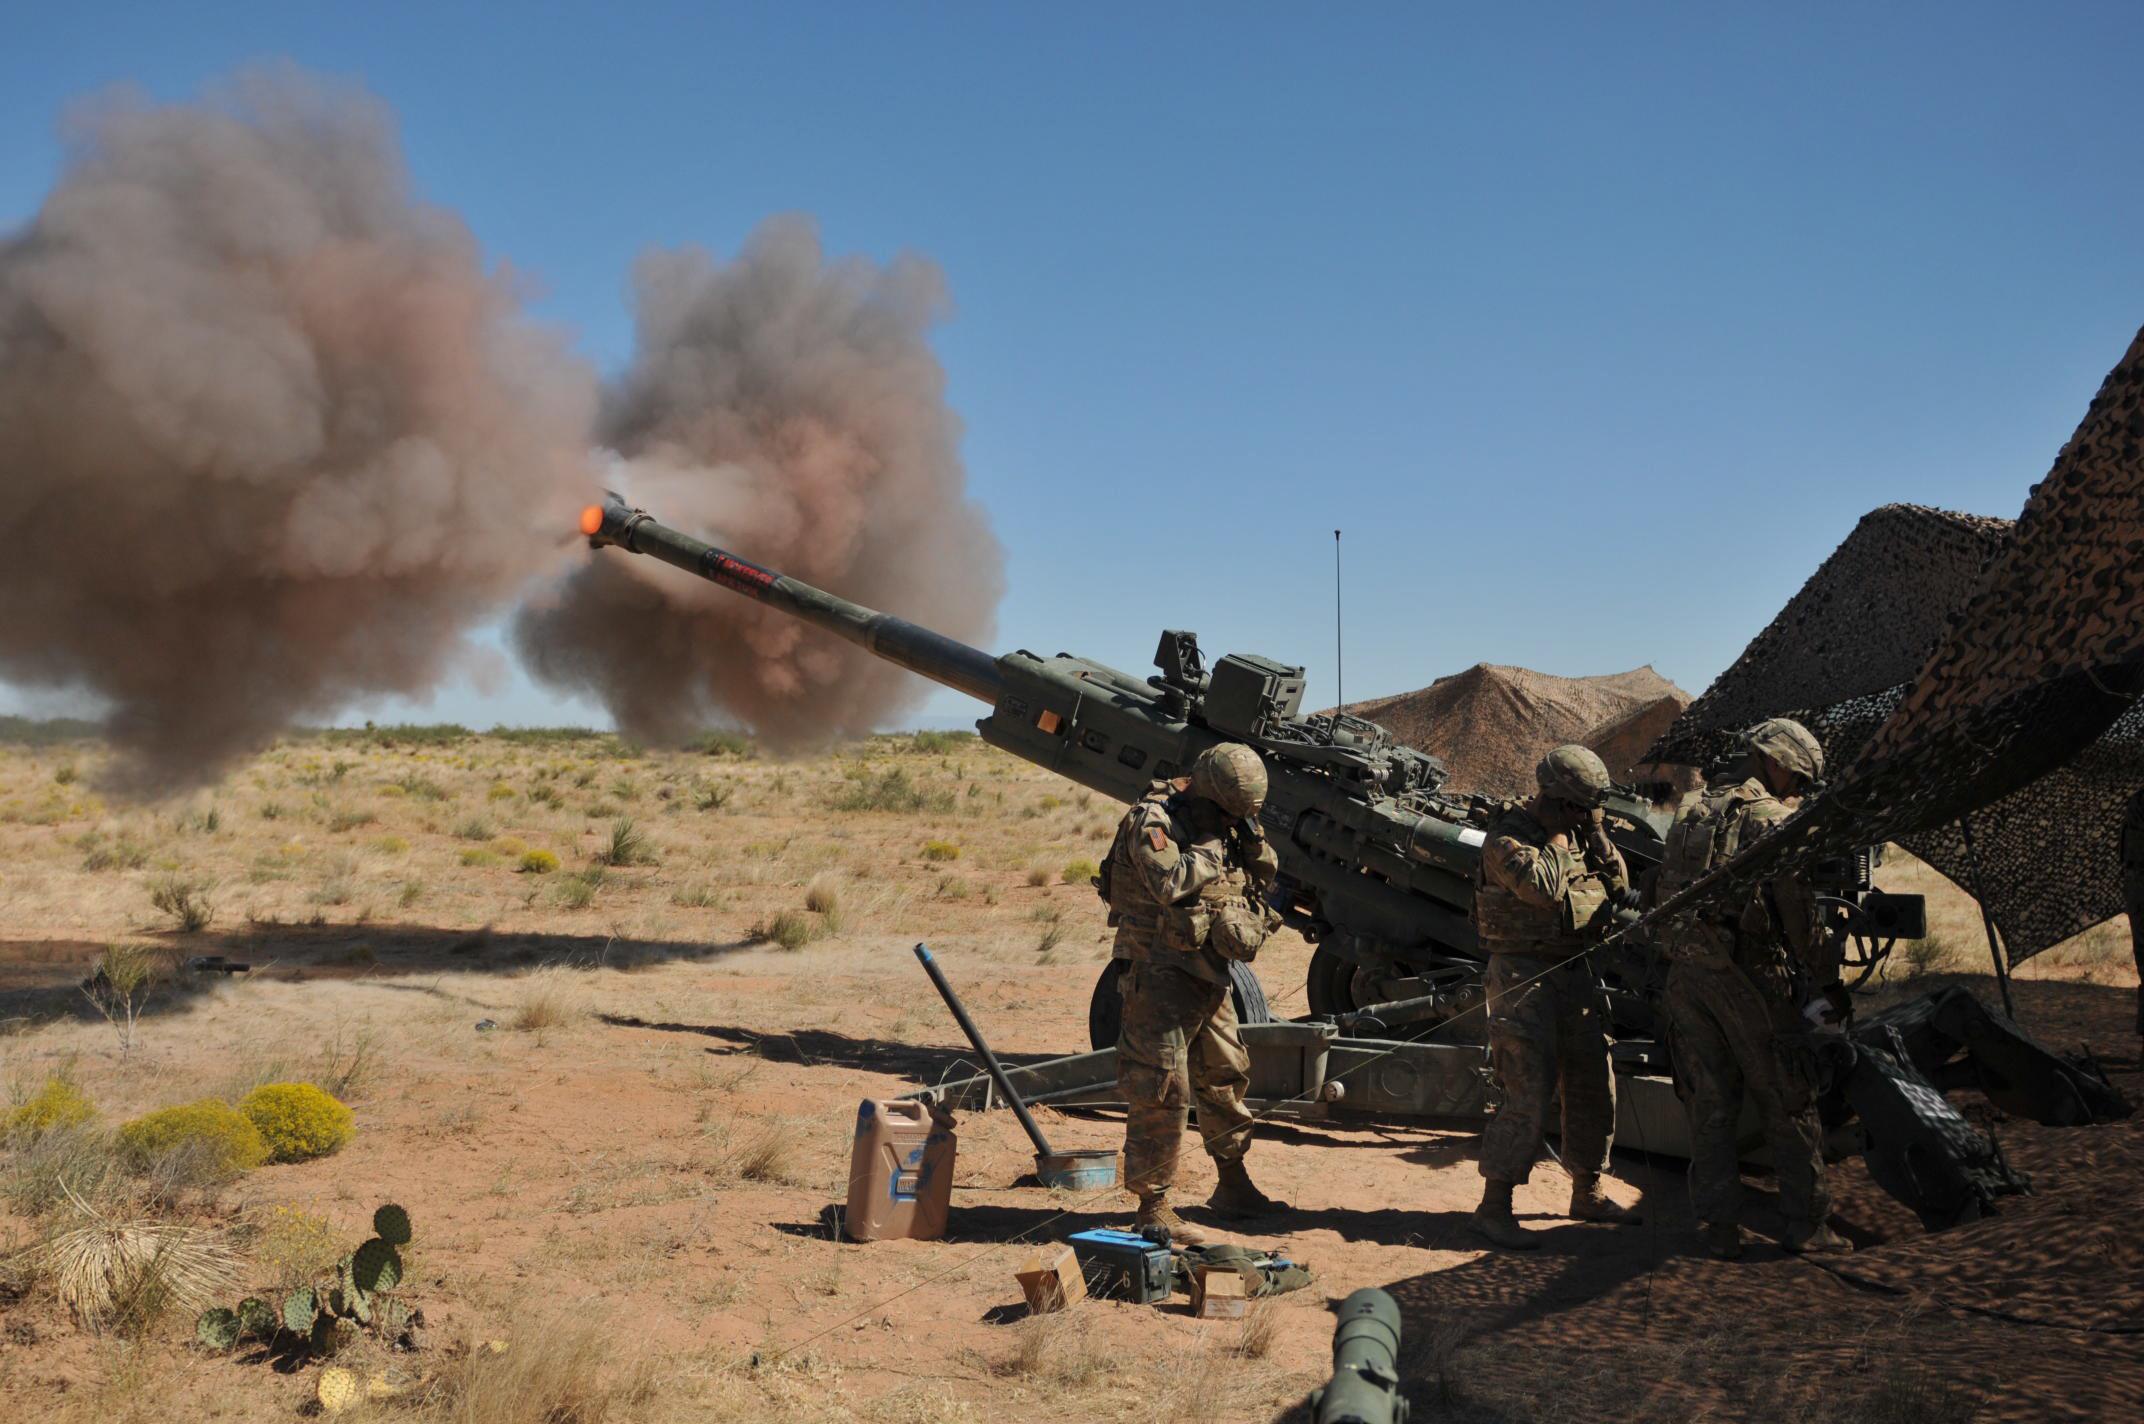 M777 howitzer artillery piece photo